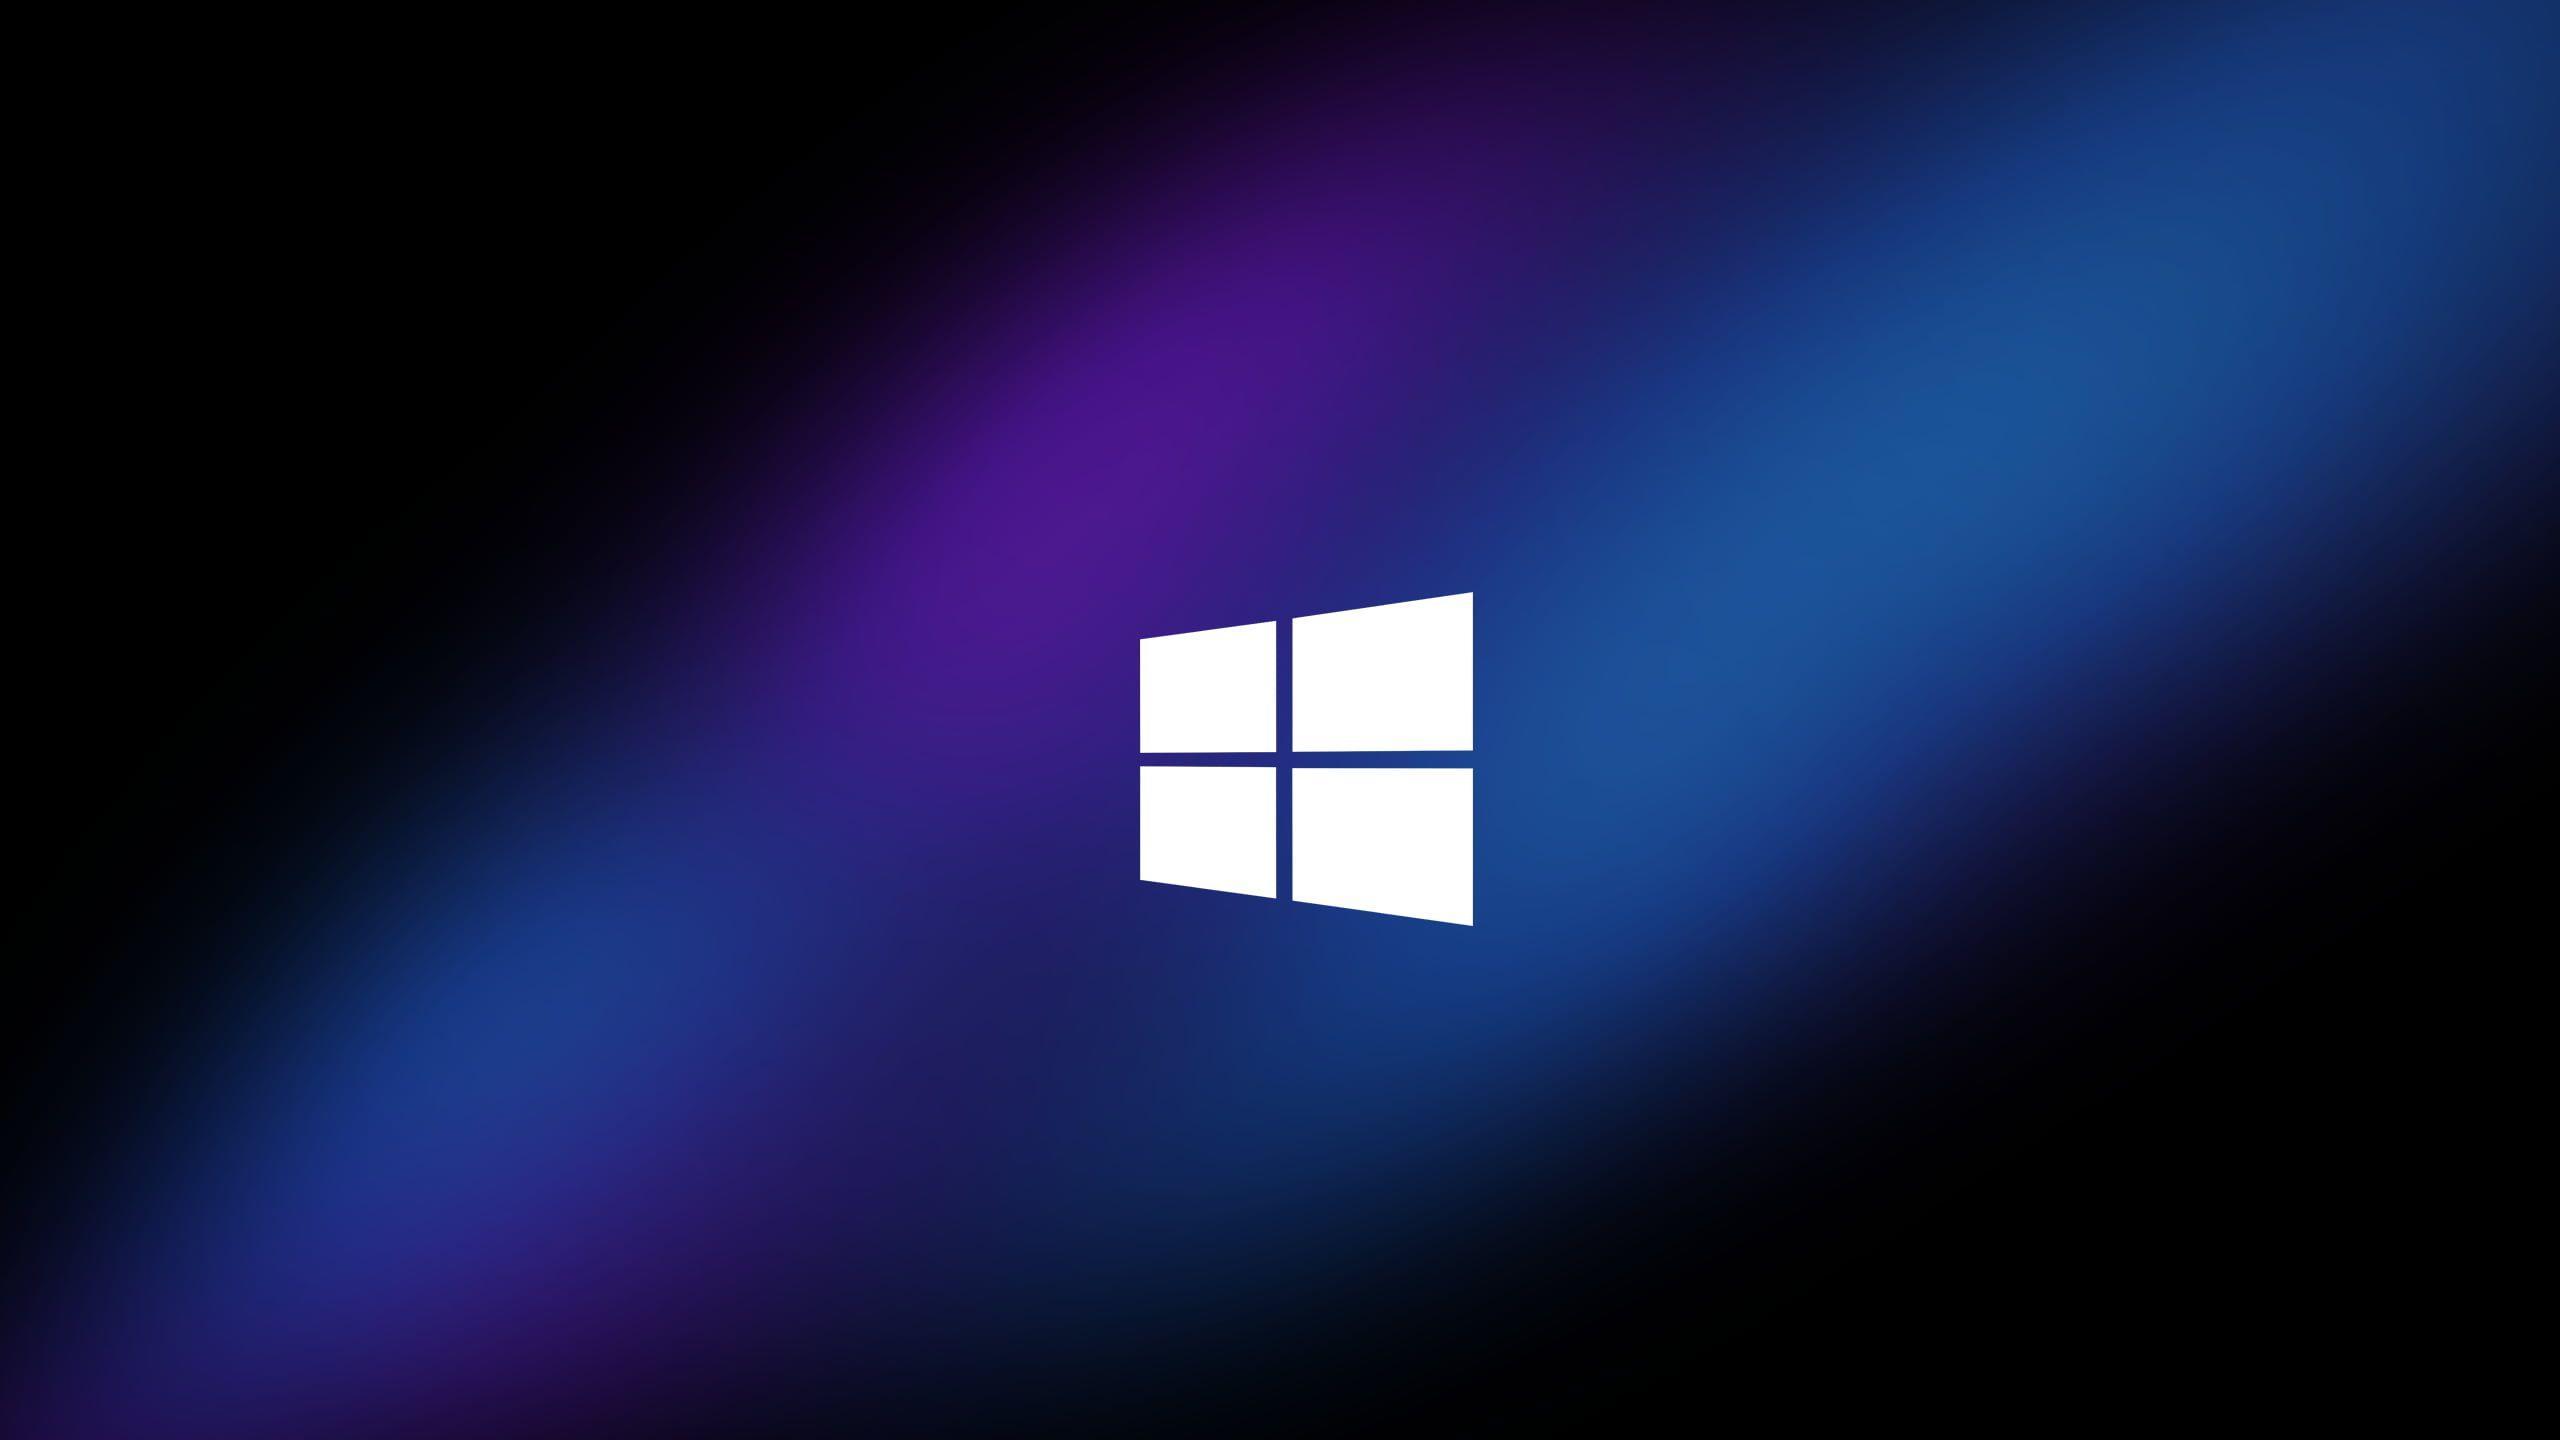 Dark Windows Logo Wallpapers Top Free Dark Windows Logo Backgrounds Wallpaperaccess